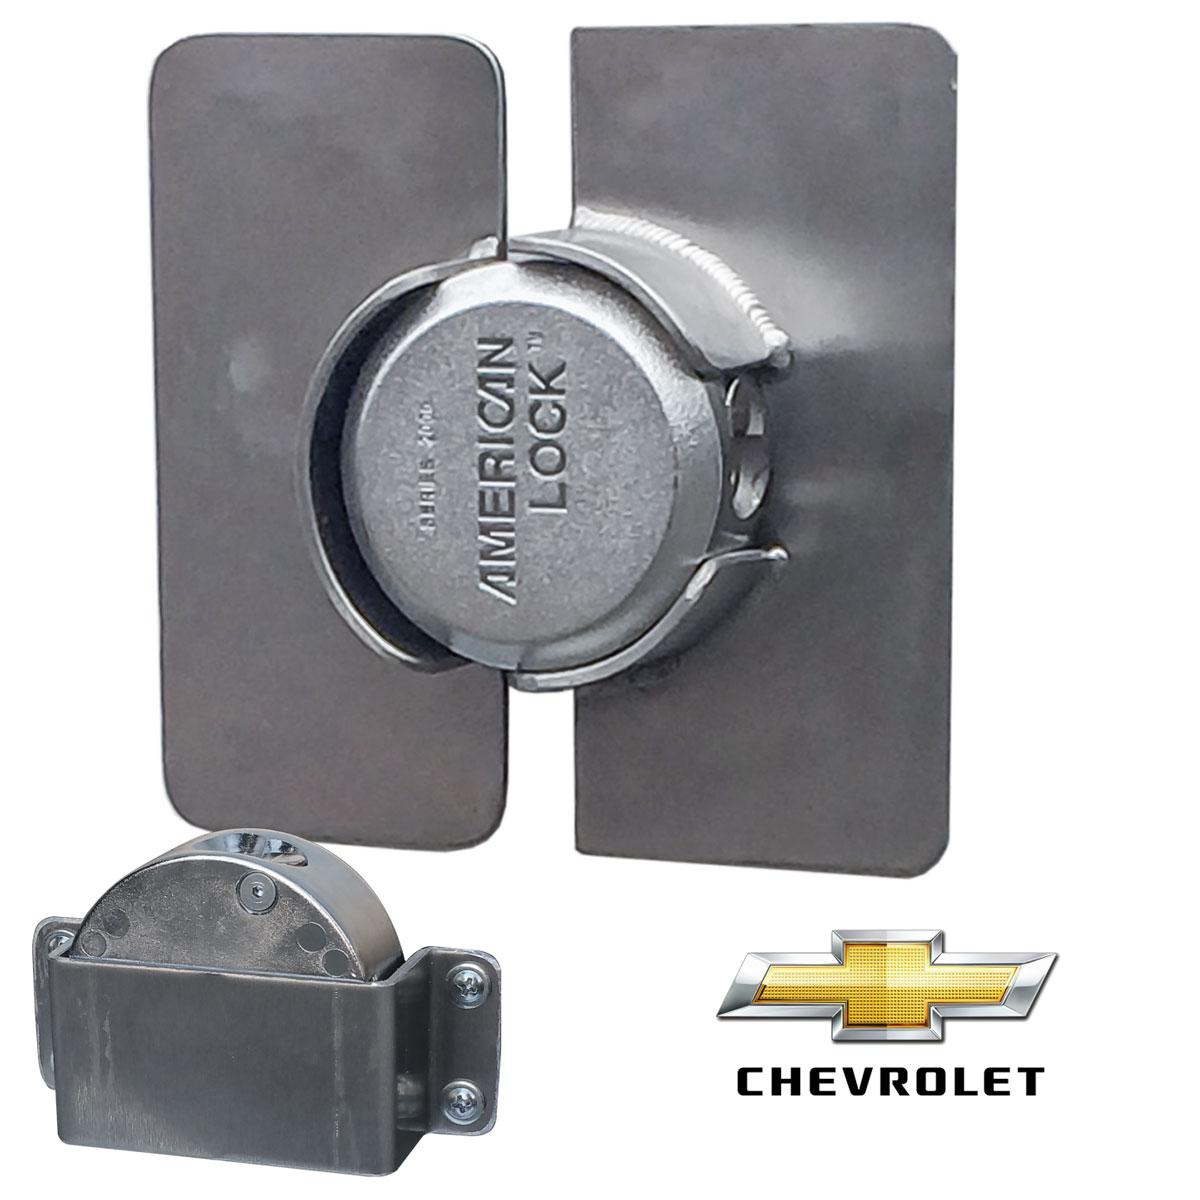 Chevy CargoPuck Lock Kit Passenger/Barn DoorSKU: 170014